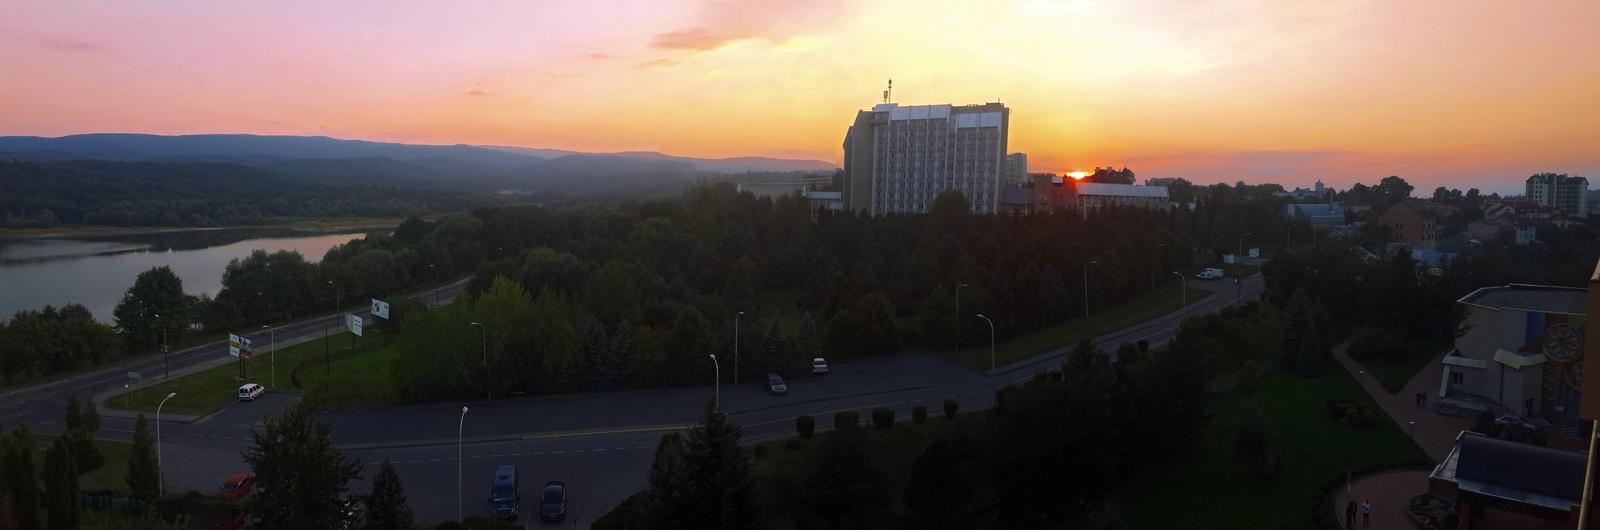 truskawez city header